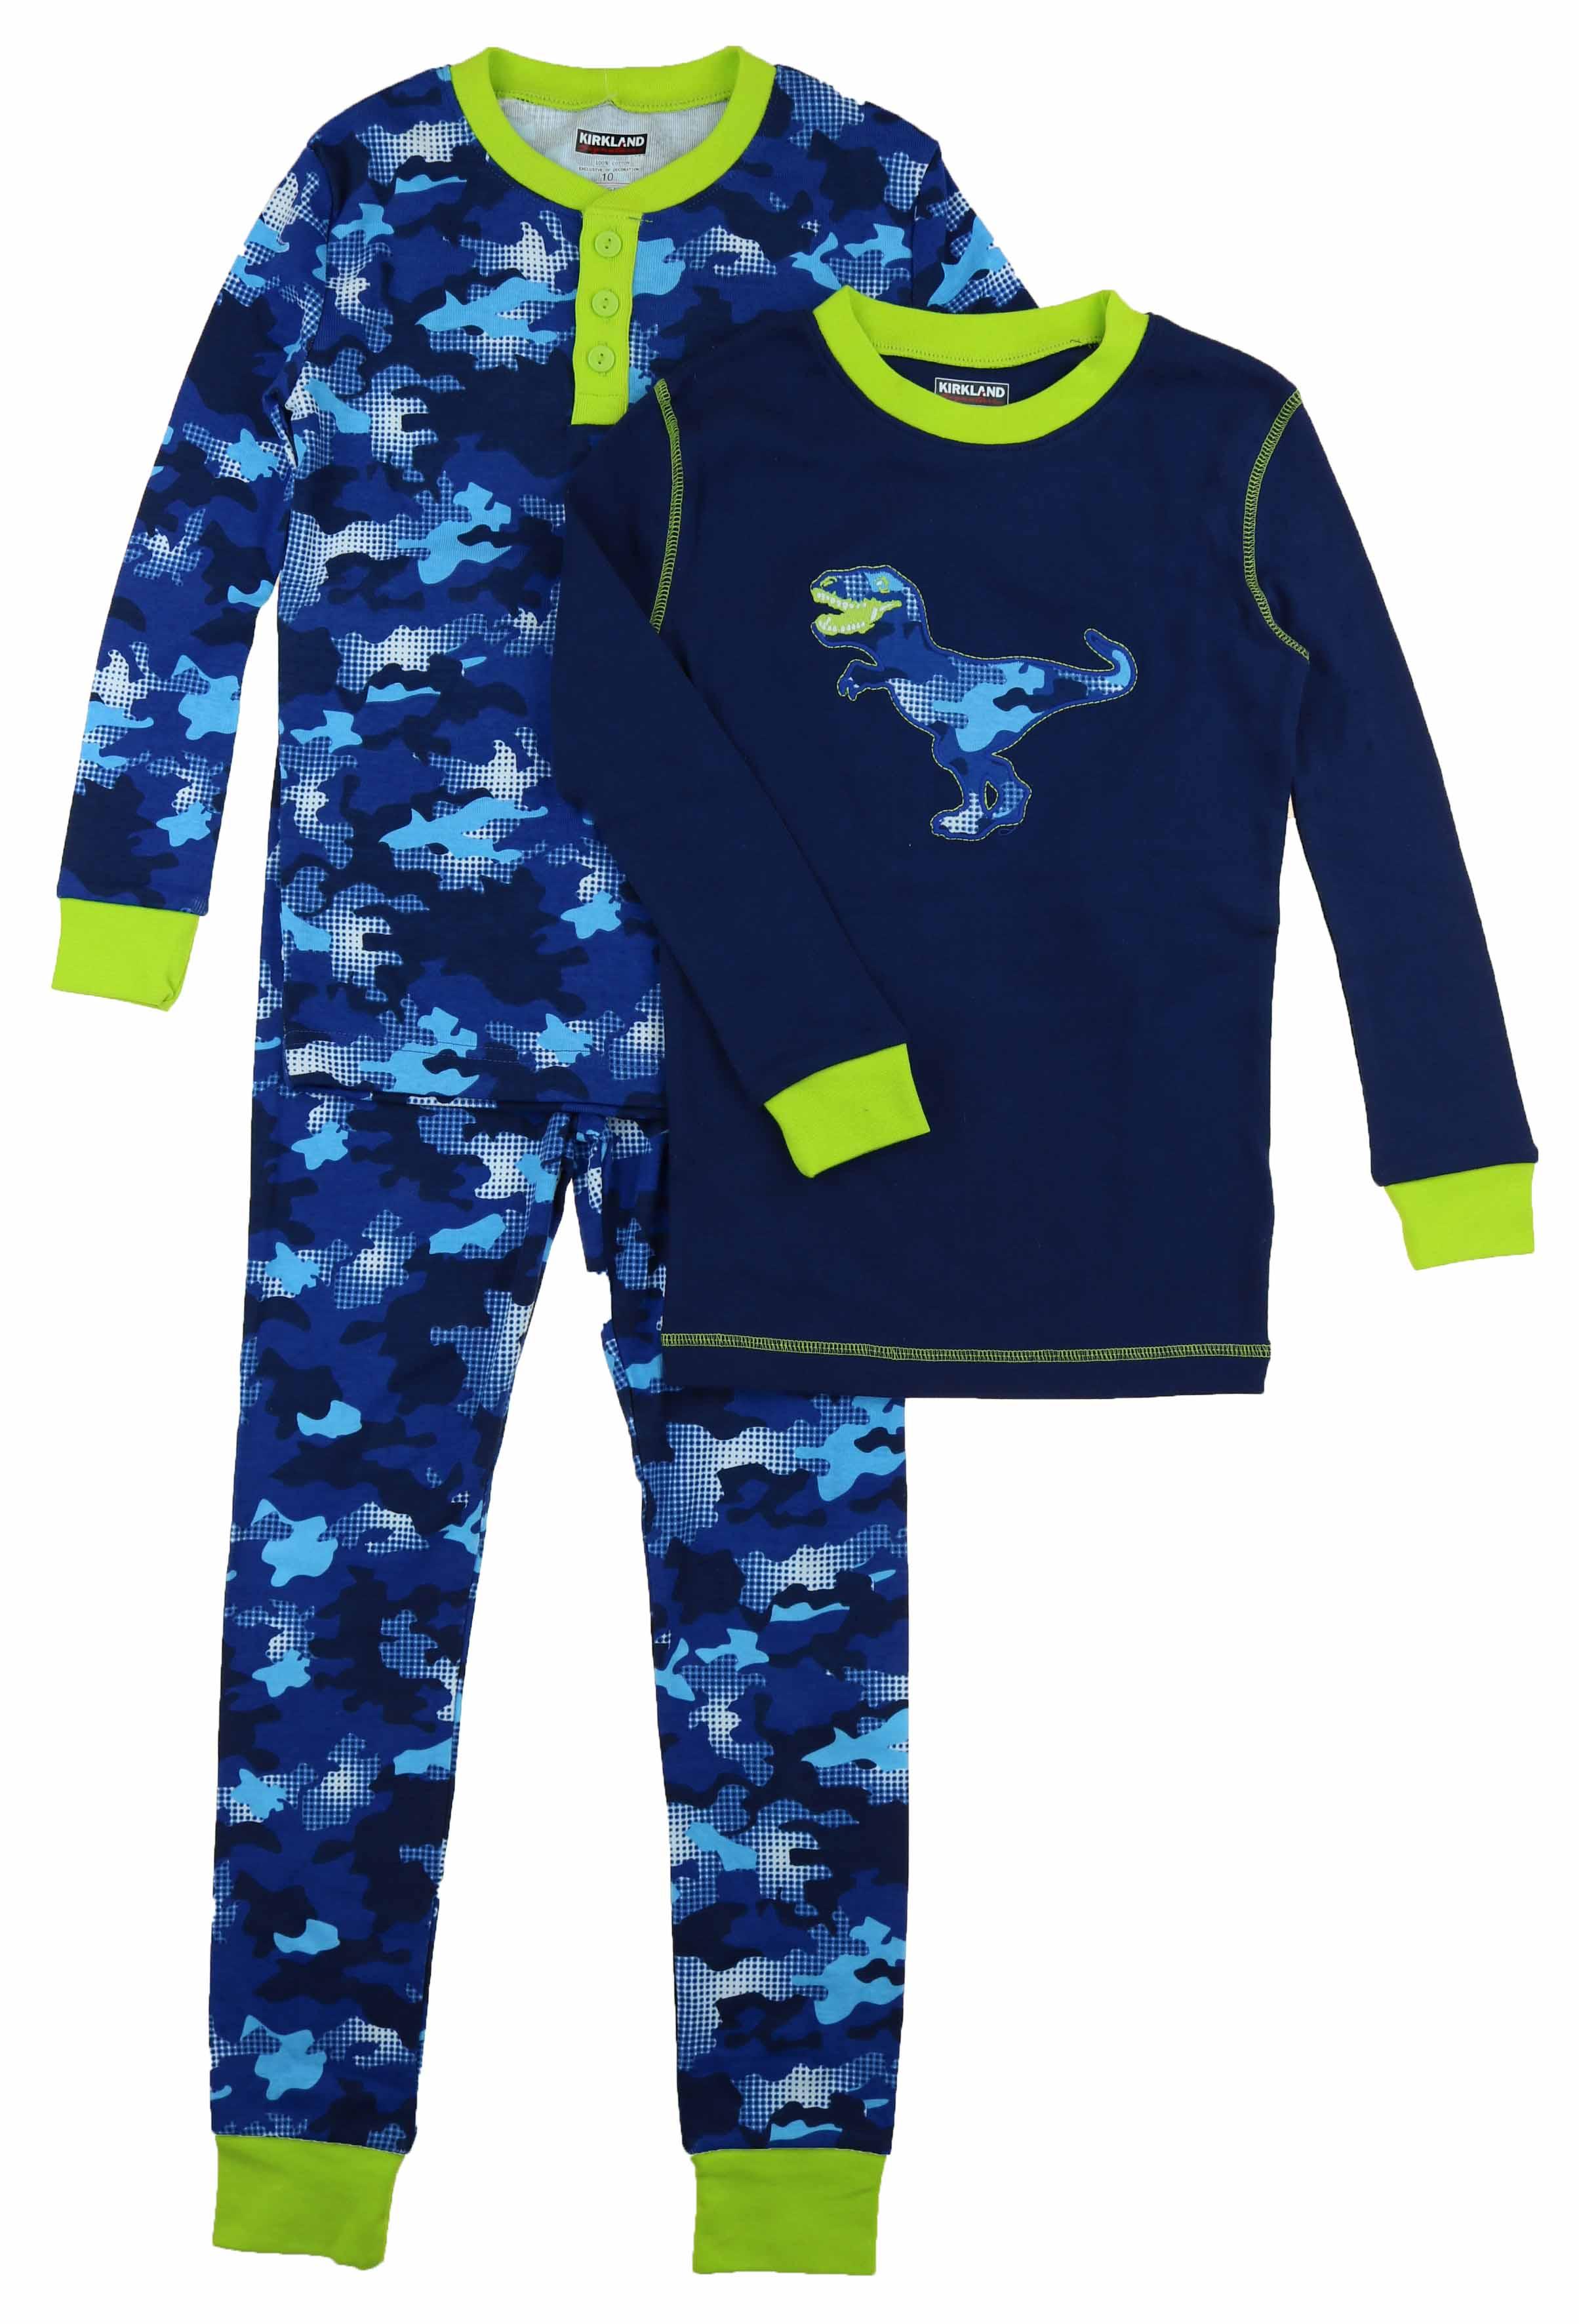 fa540e9d7 Kirkland Signature Boy s 3 Piece Mix and Match Organic Cotton Pajama ...